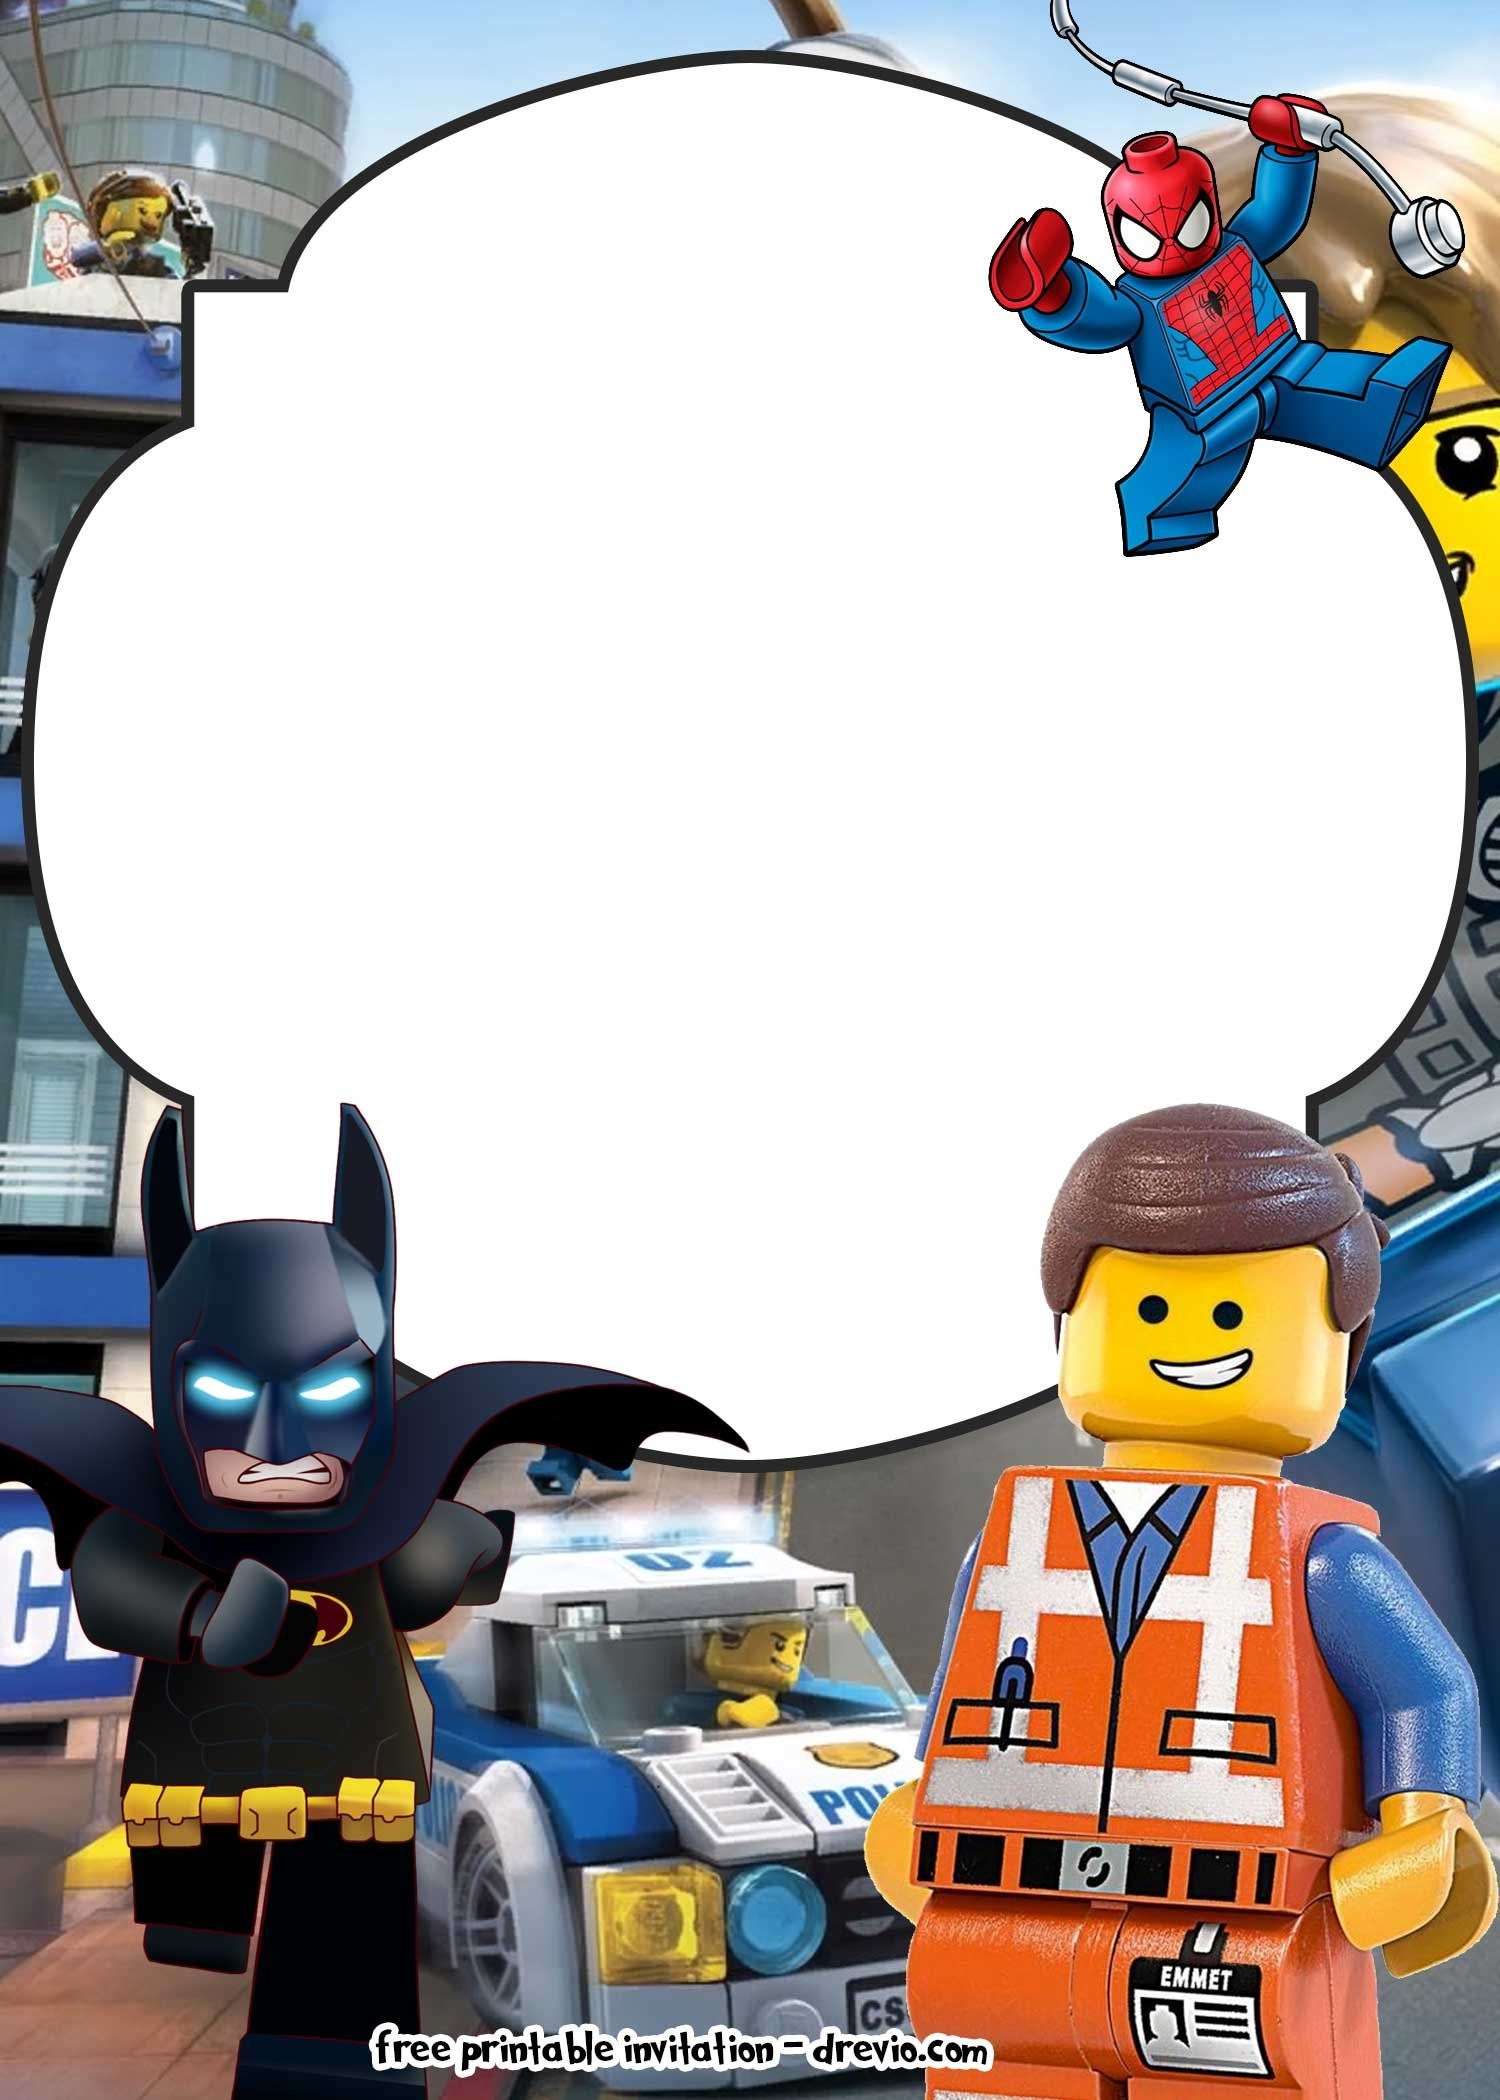 Free Lego Movie Invitations For | Free Printable Birthday - Lego Batman Invitations Free Printable